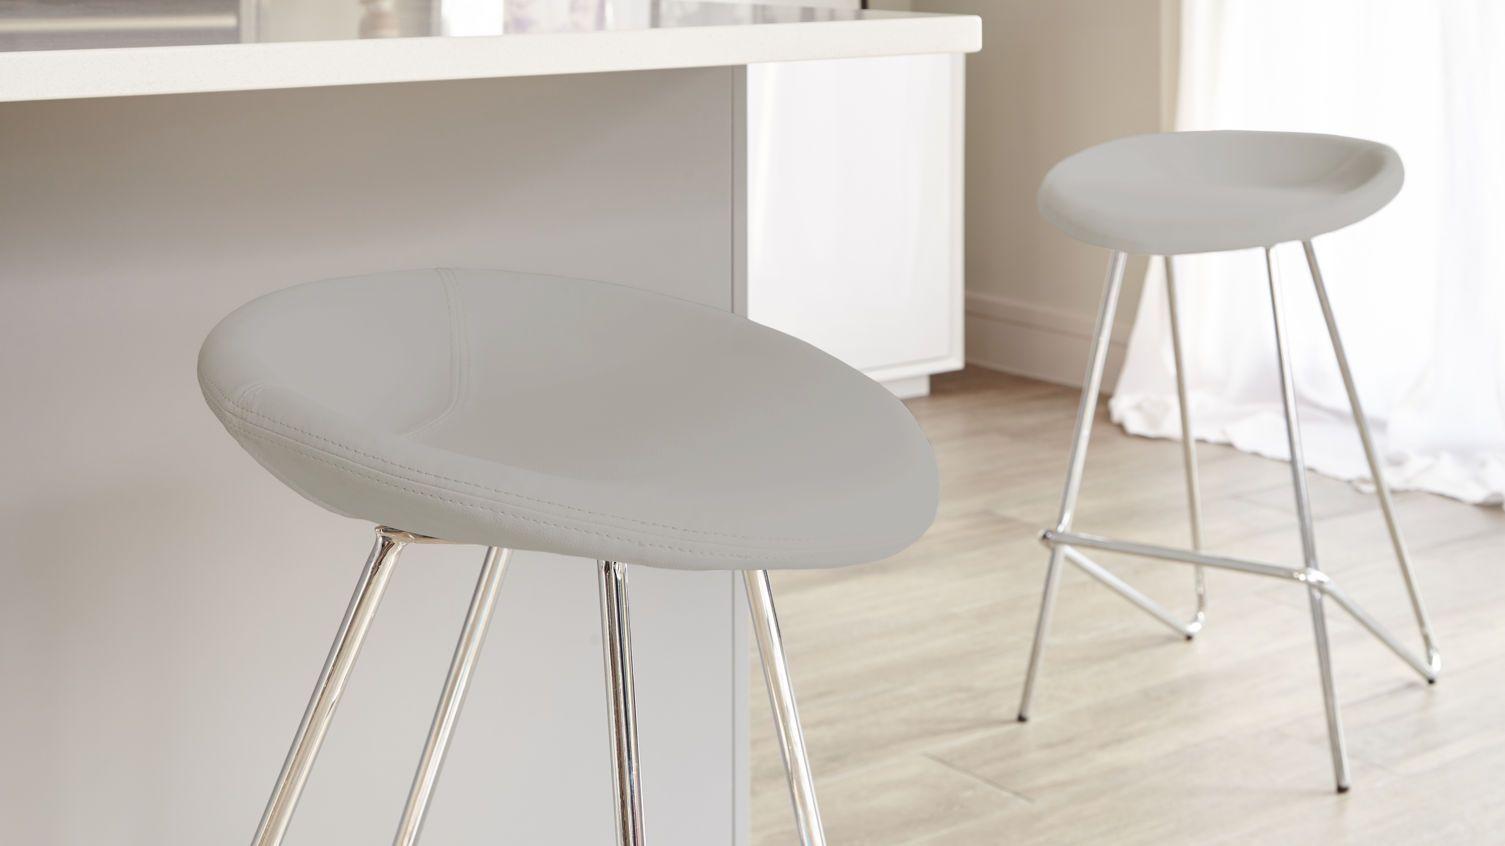 Anzio Modern Bar Stool Bar stools, Modern bar stools